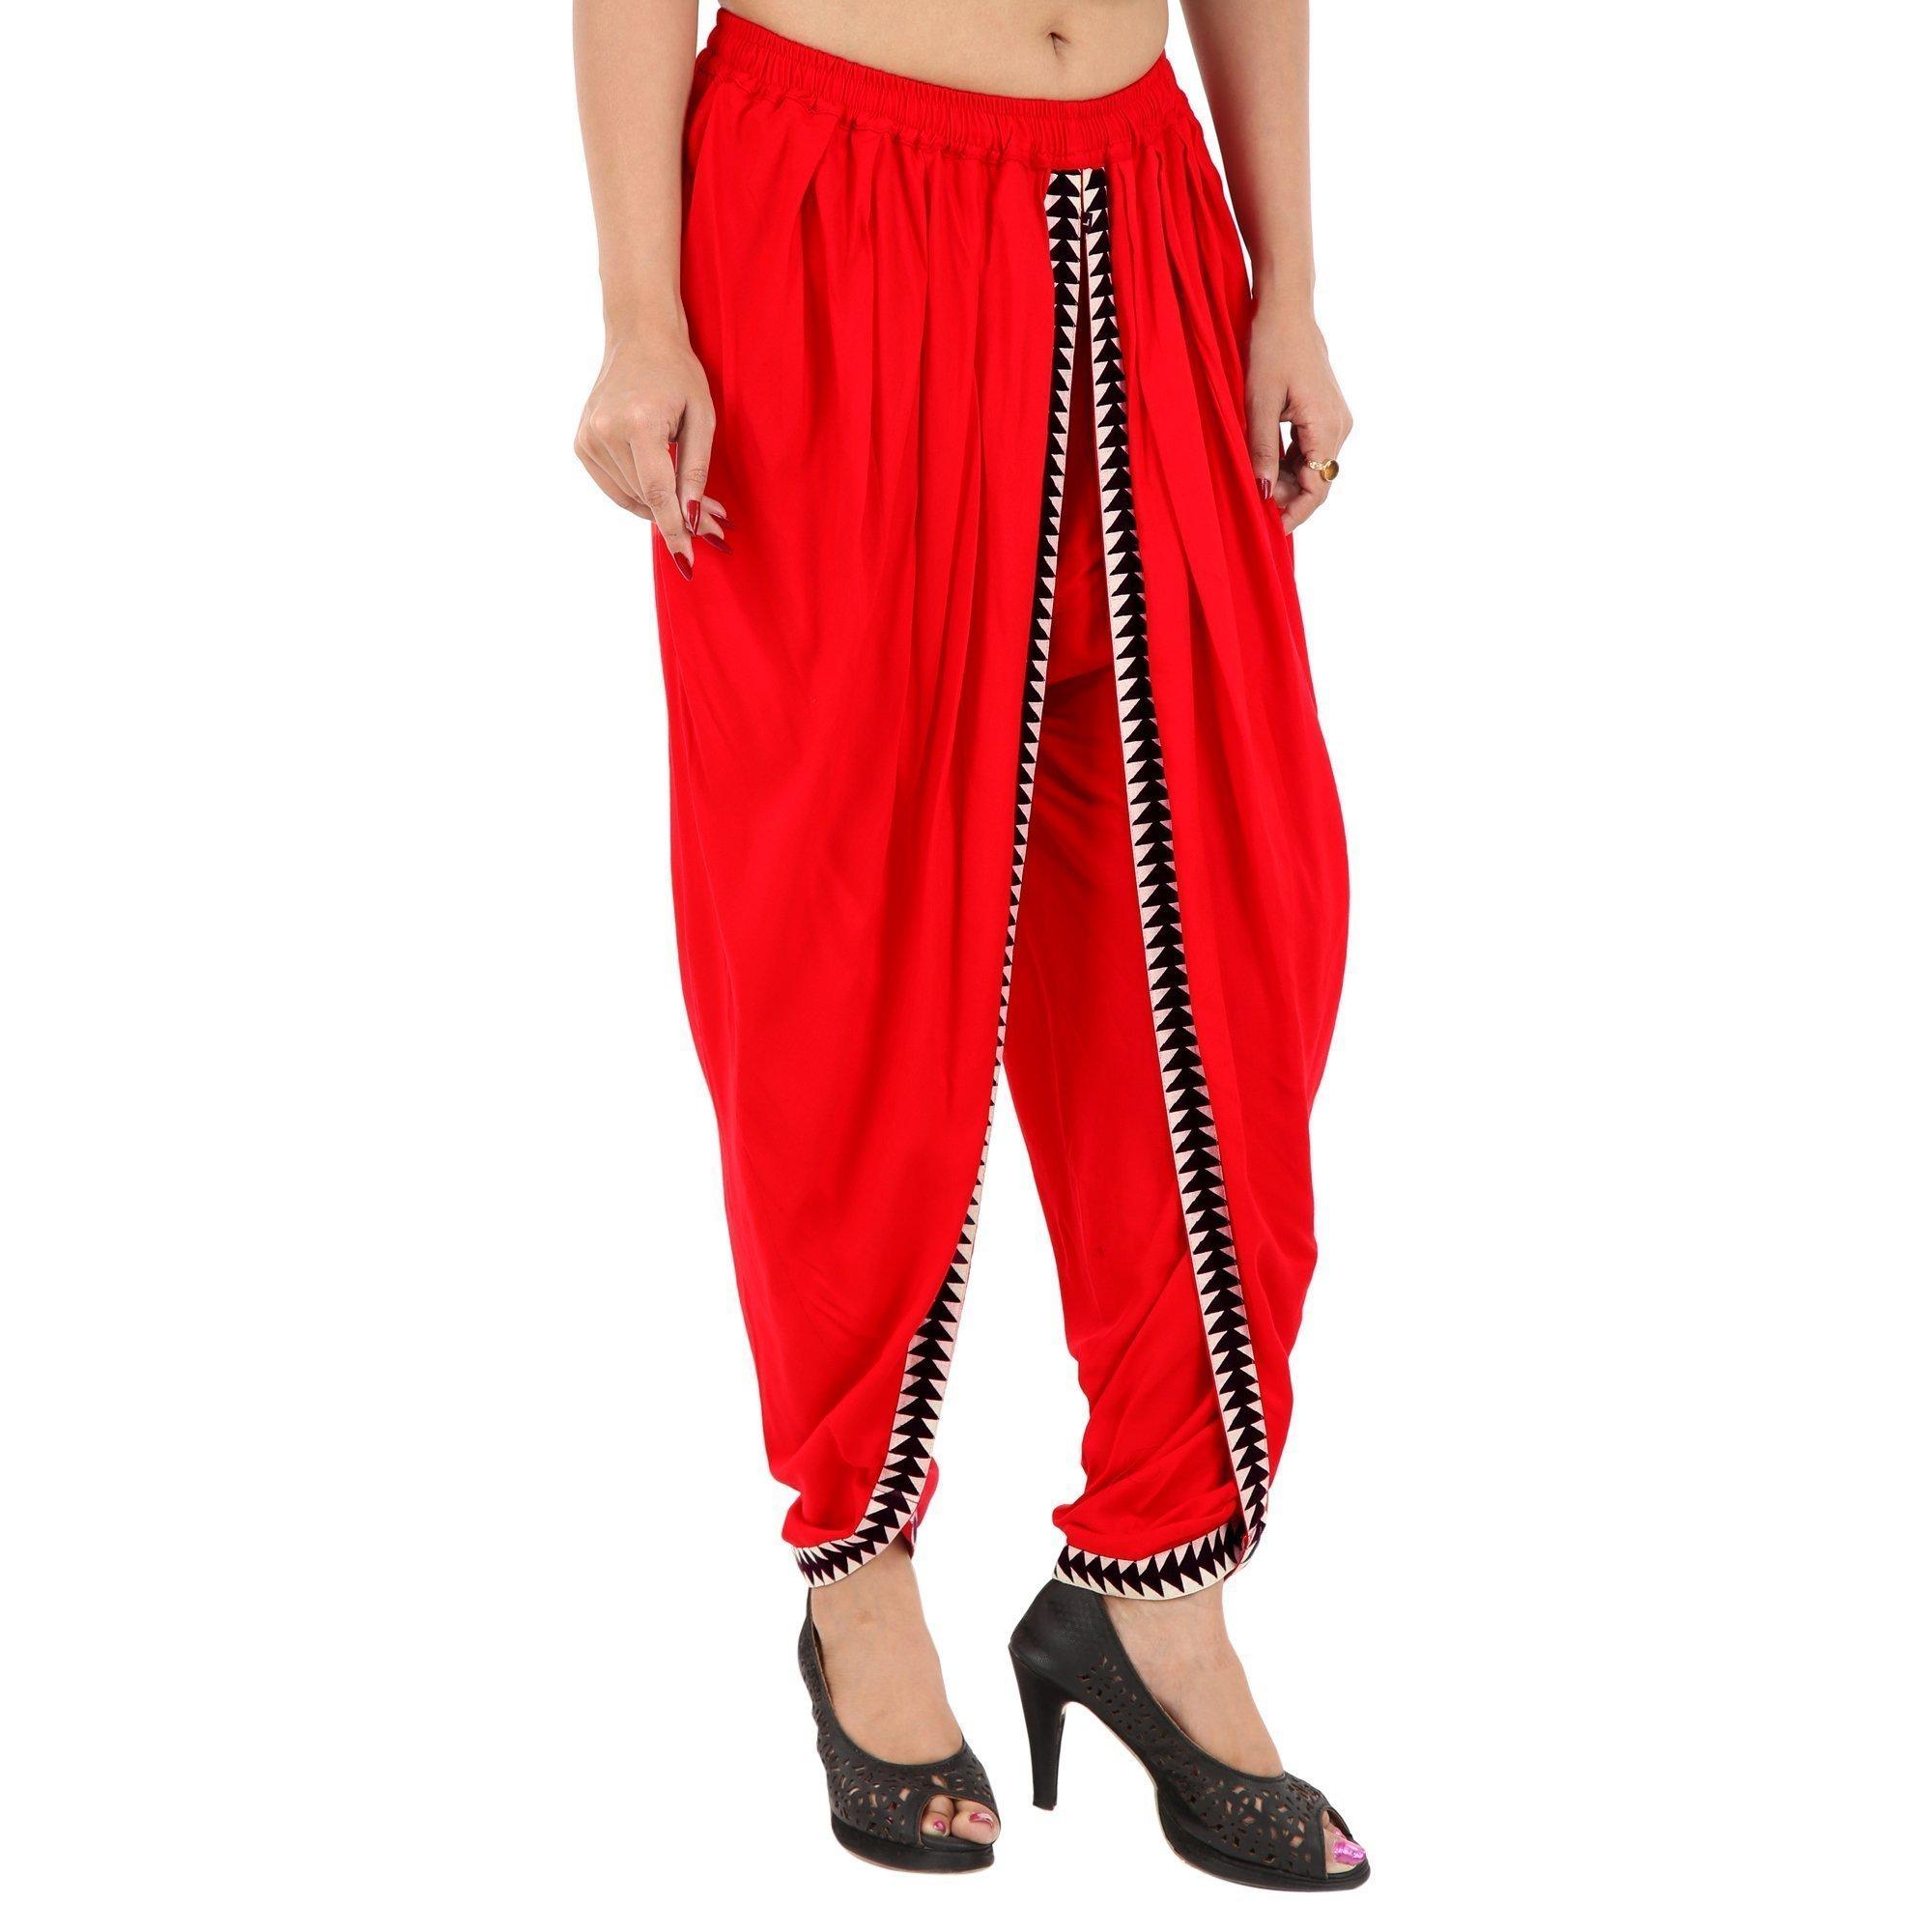 Elegant and Classic Red Color Rayon Dhoti Pant, Patiala Dhoti Salwar, Dhoti Trousers for Women, Girls